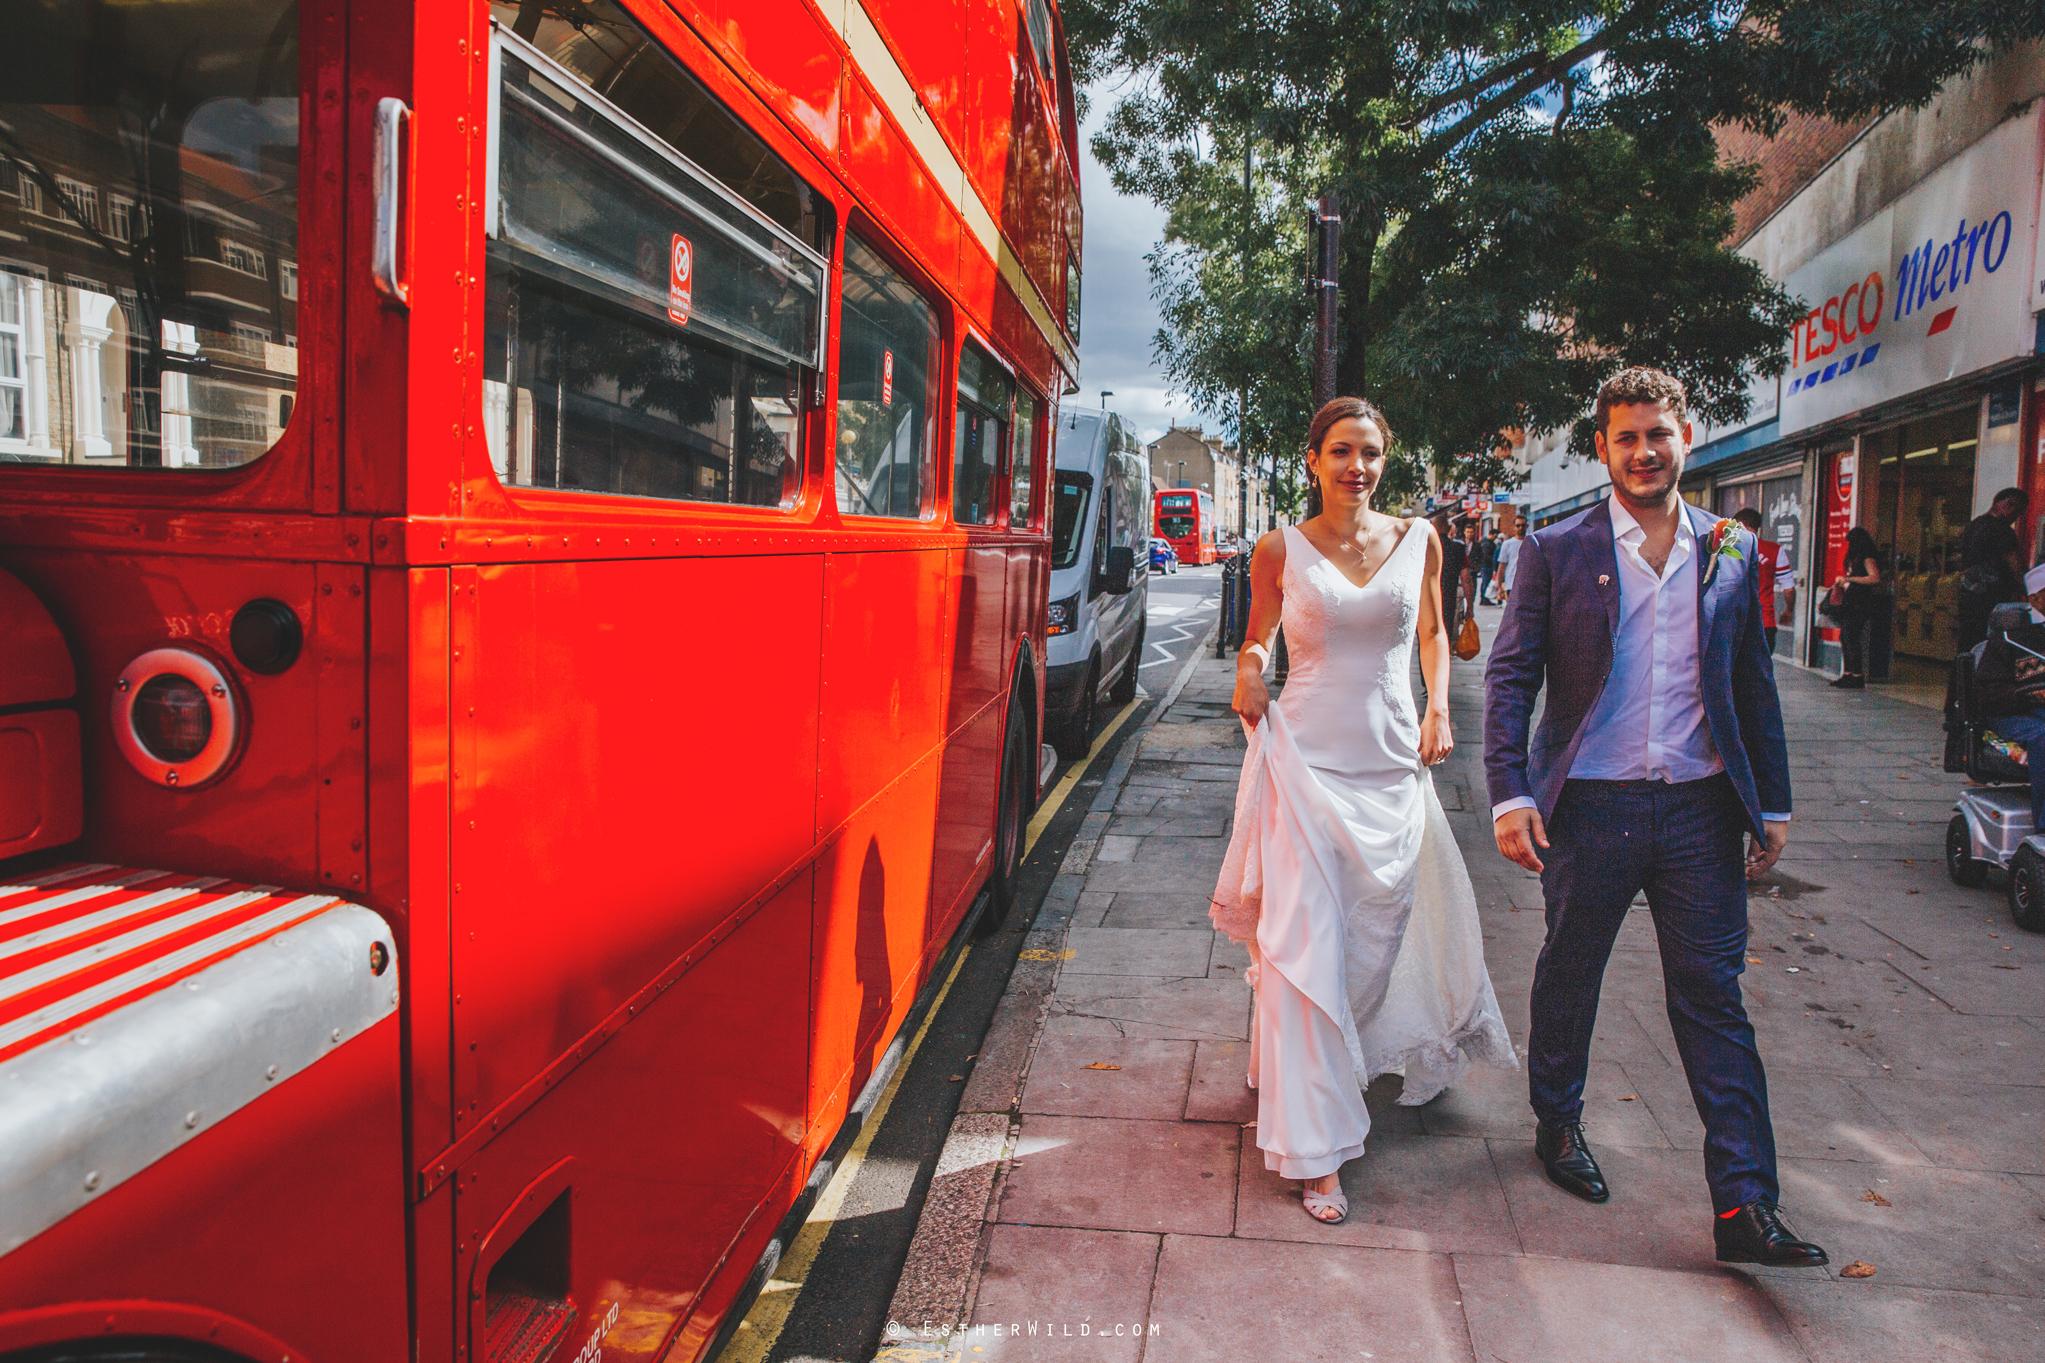 Islington_Town_Hall_Wedding_London_Photographer_Esther_Wild_IMG_5573.jpg